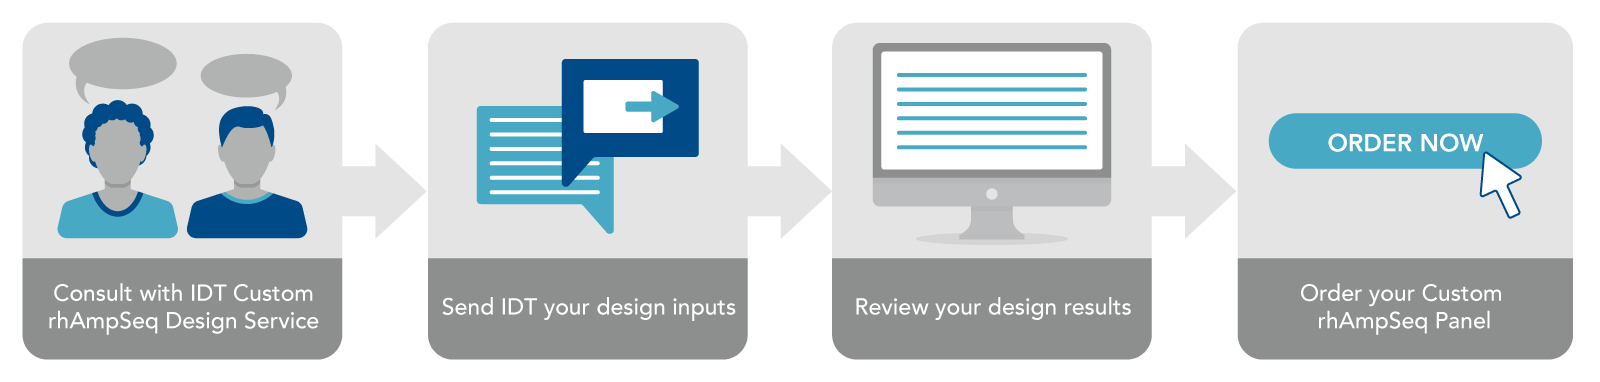 rhAmpSeq Design Service process